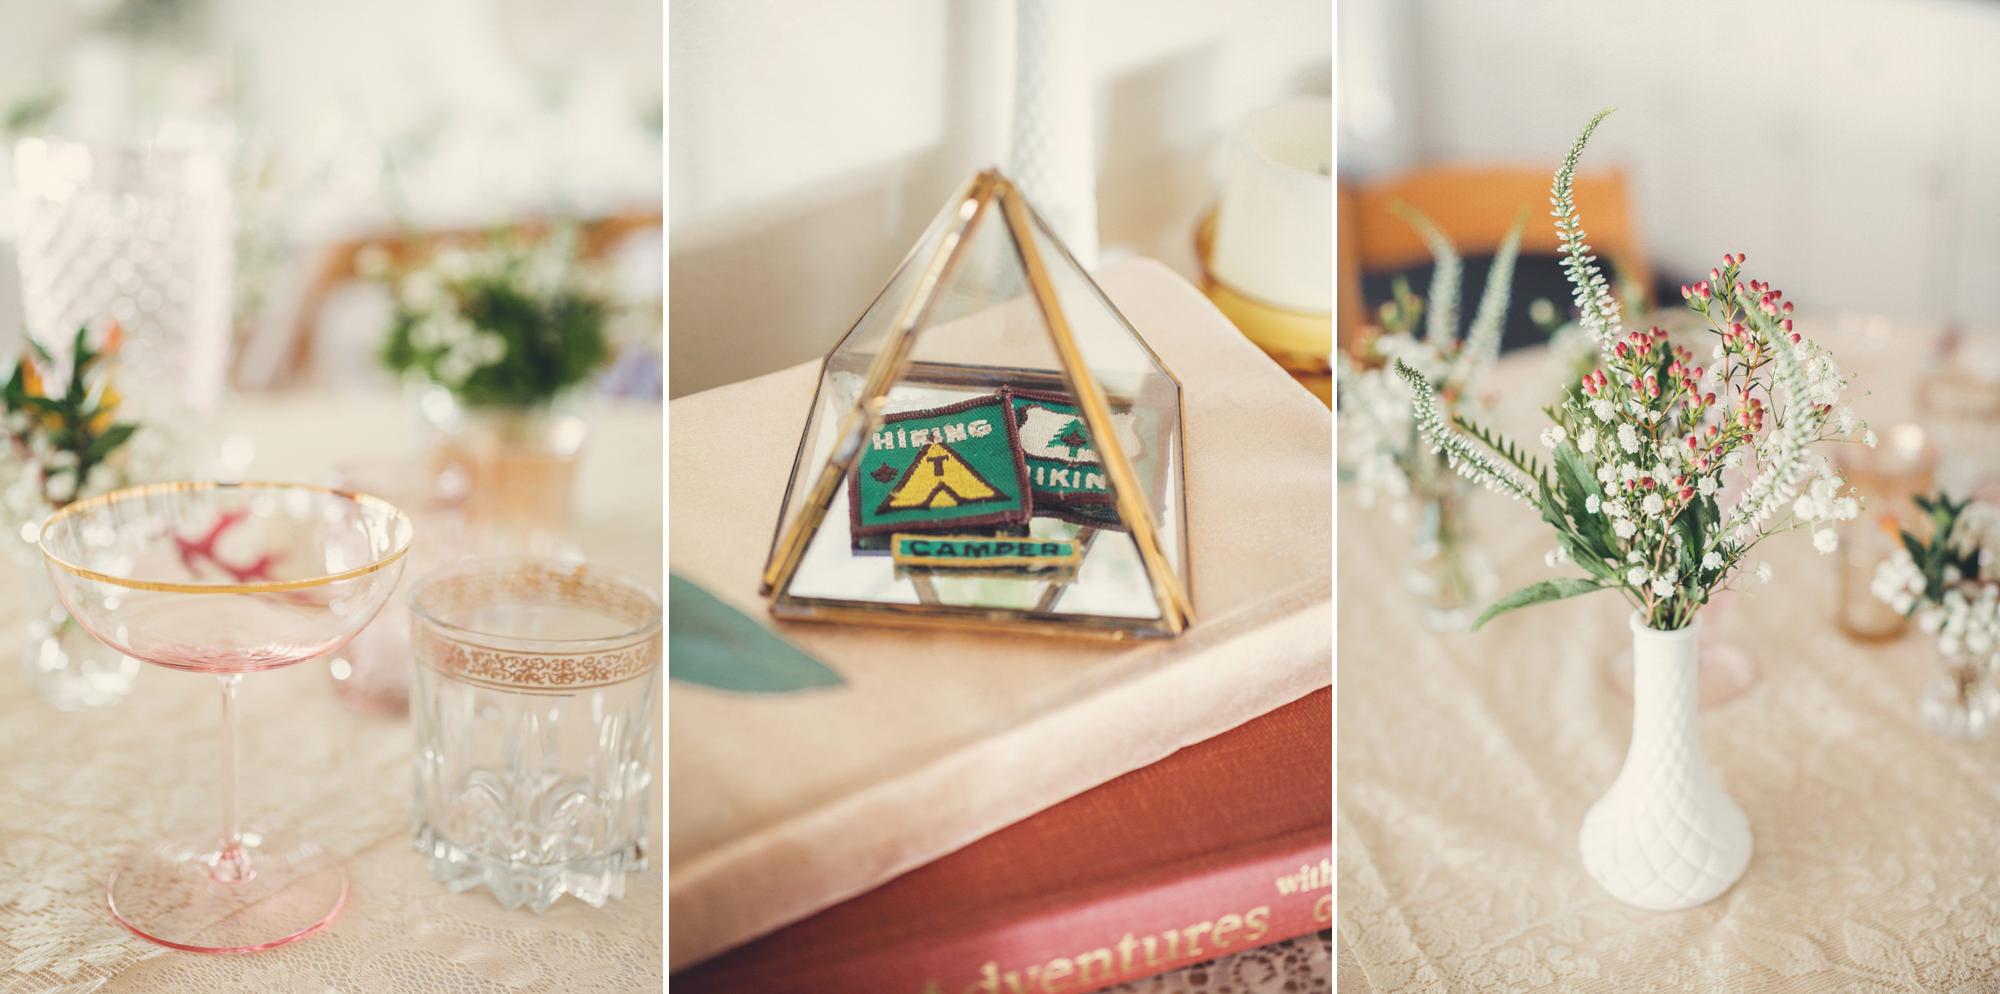 Little River Inn Wedding@Anne-Claire Brun 149